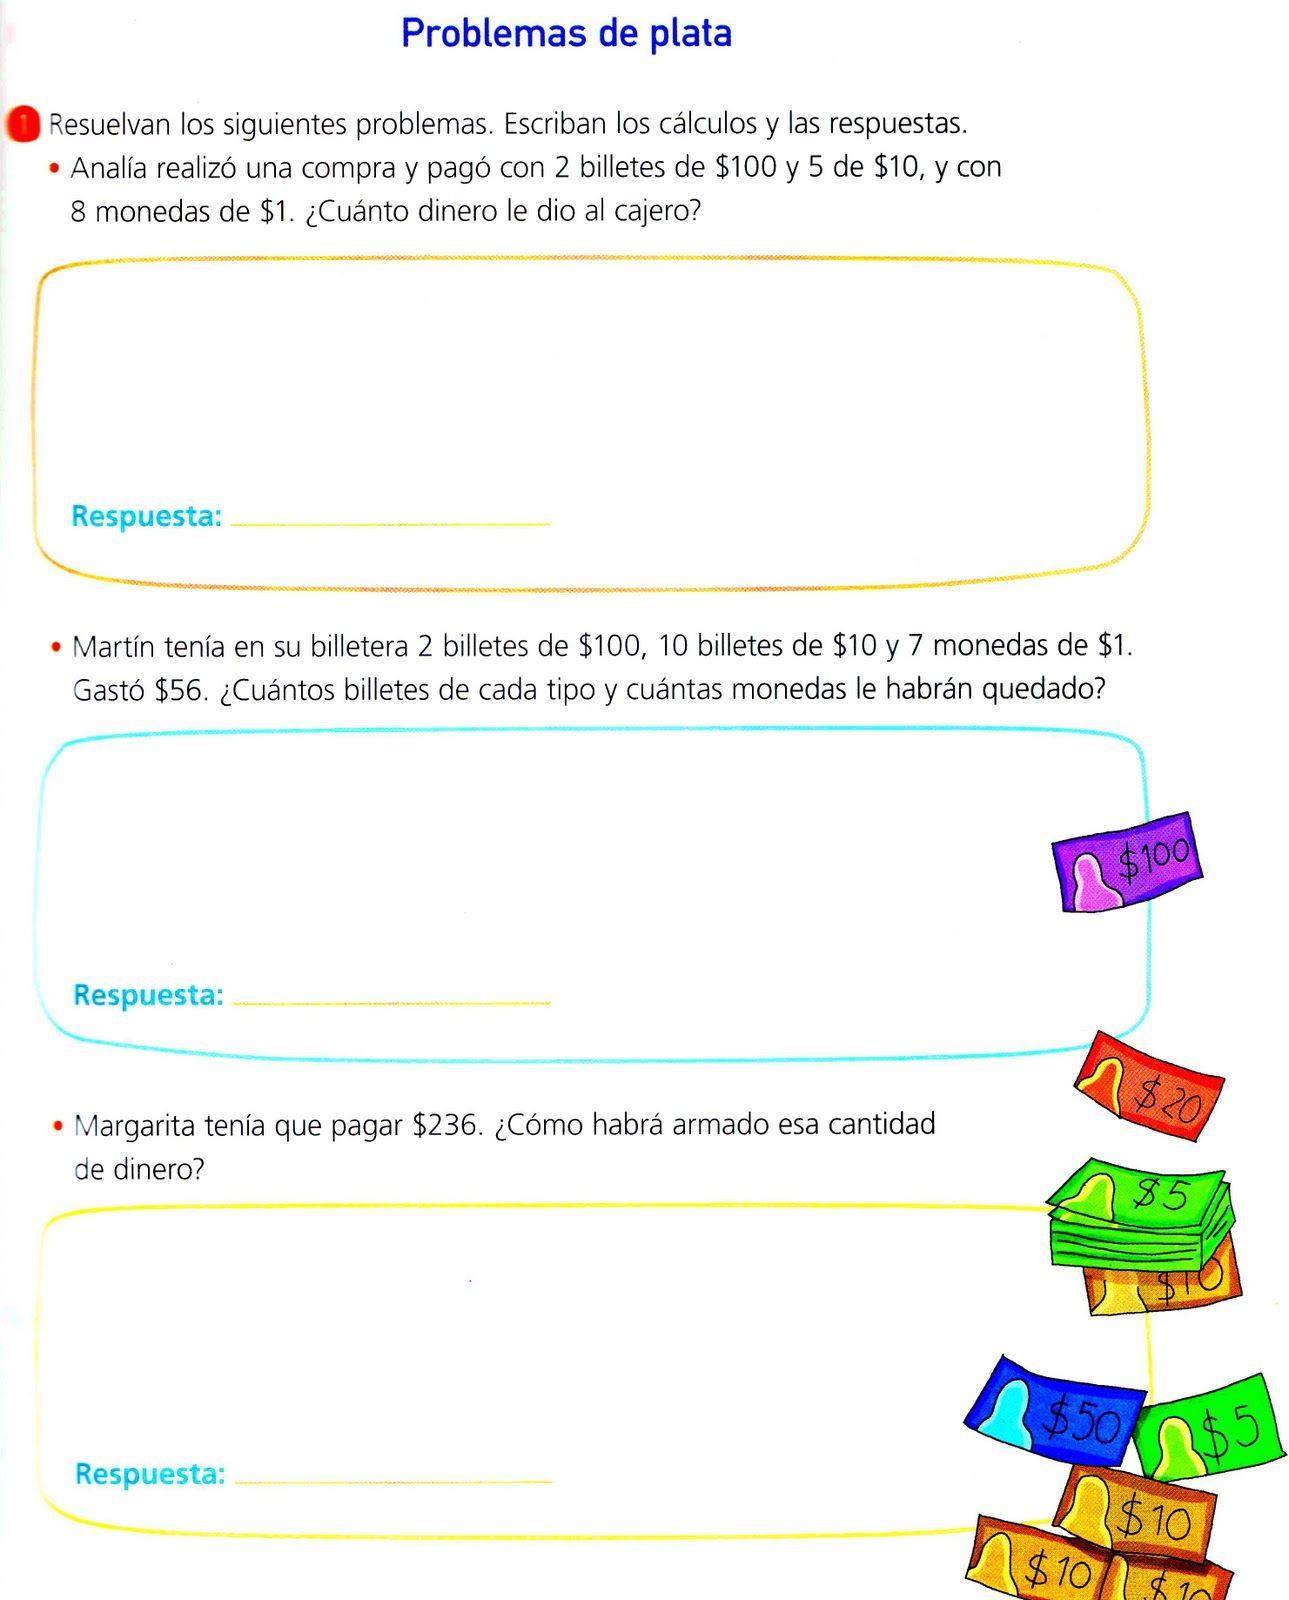 Sistema Monetario4 Jpg 1289 1600 Problemas Matemáticos Billetes Actividades De Matematicas